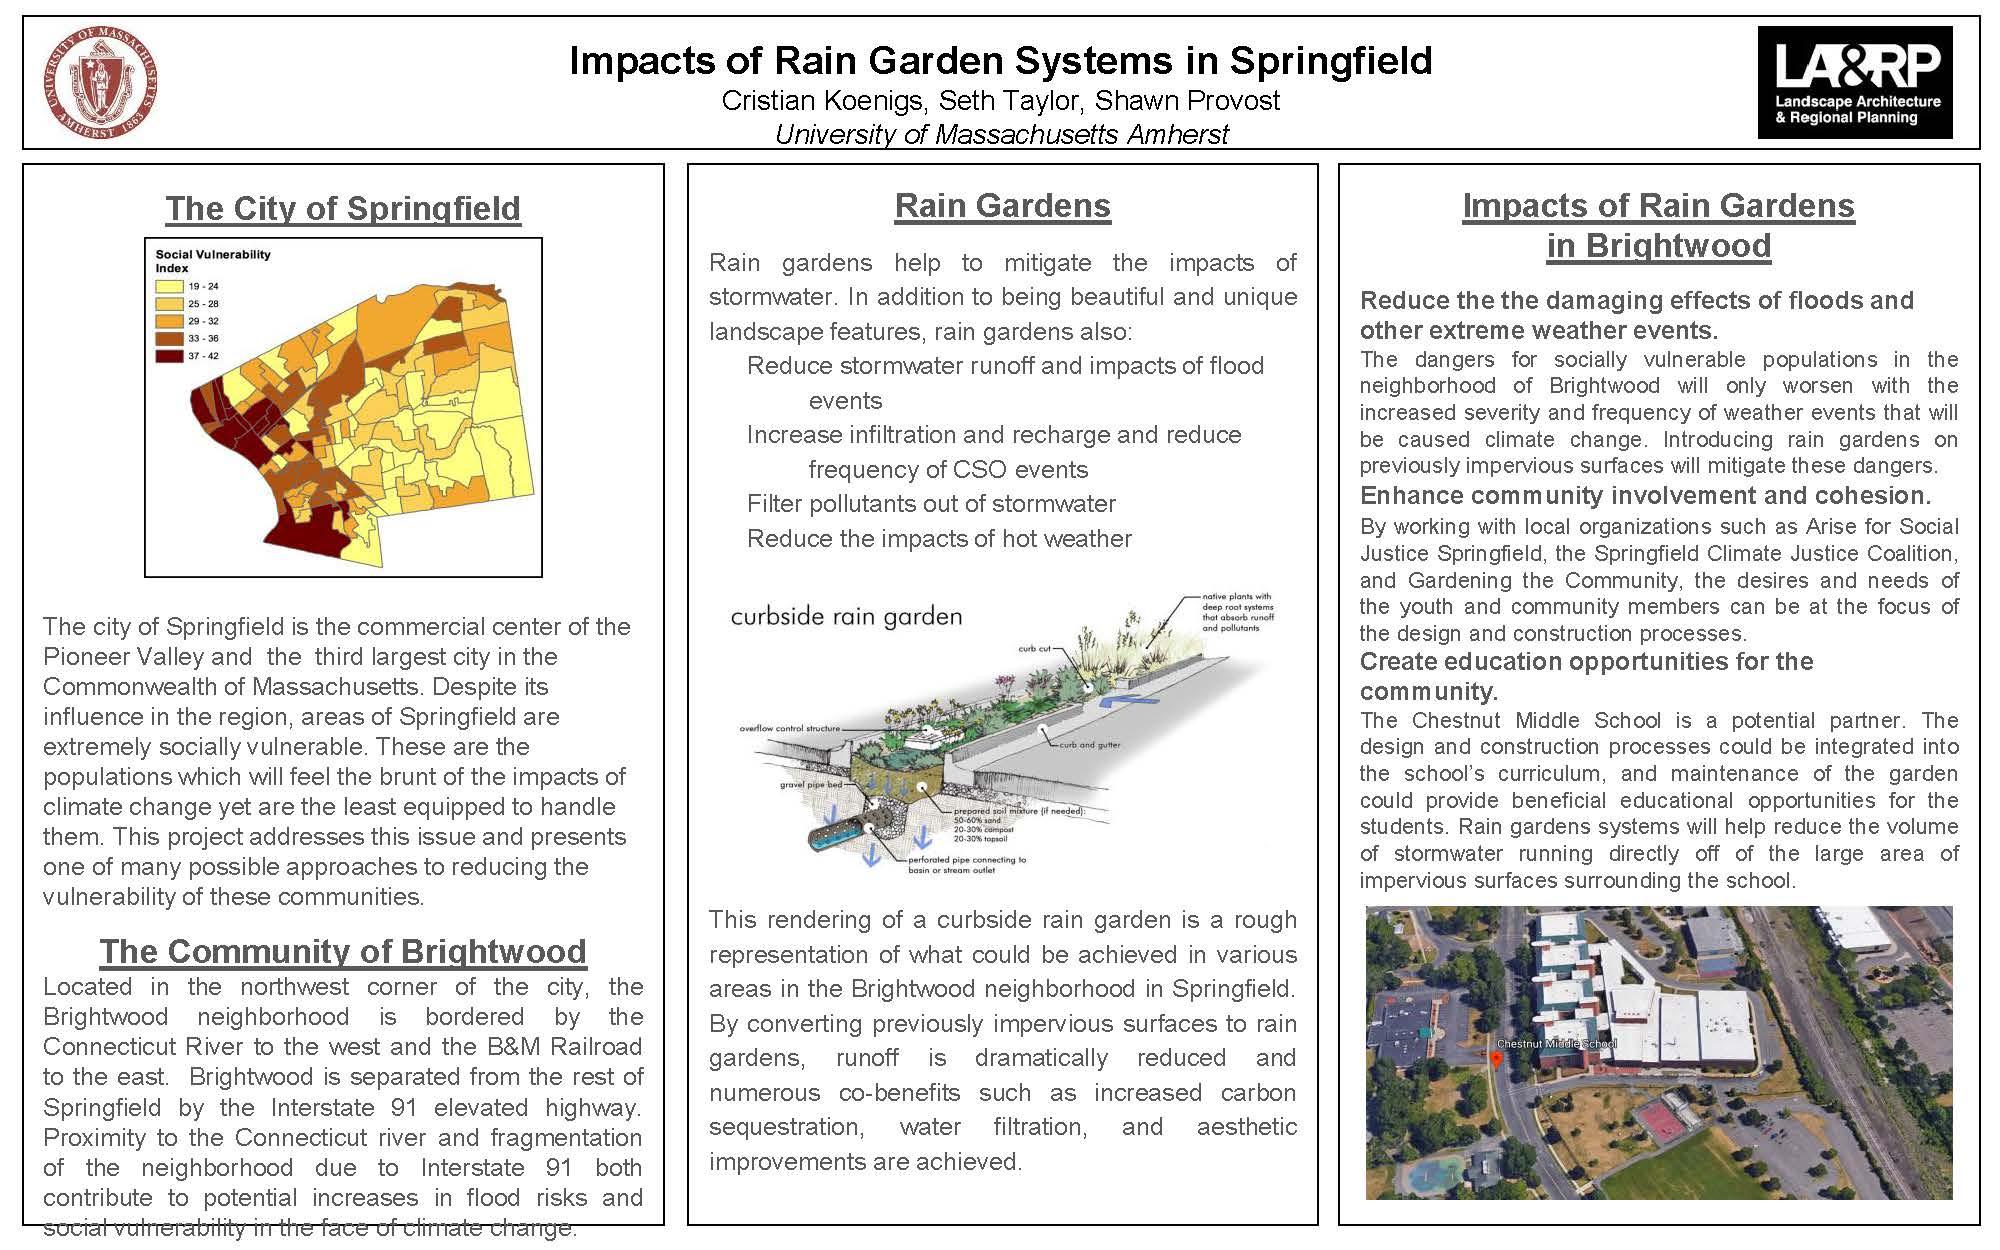 Impacts of Rain Garden Systems in Springfield - Cristian Koenigs, Seth Taylor, Shawn Provost